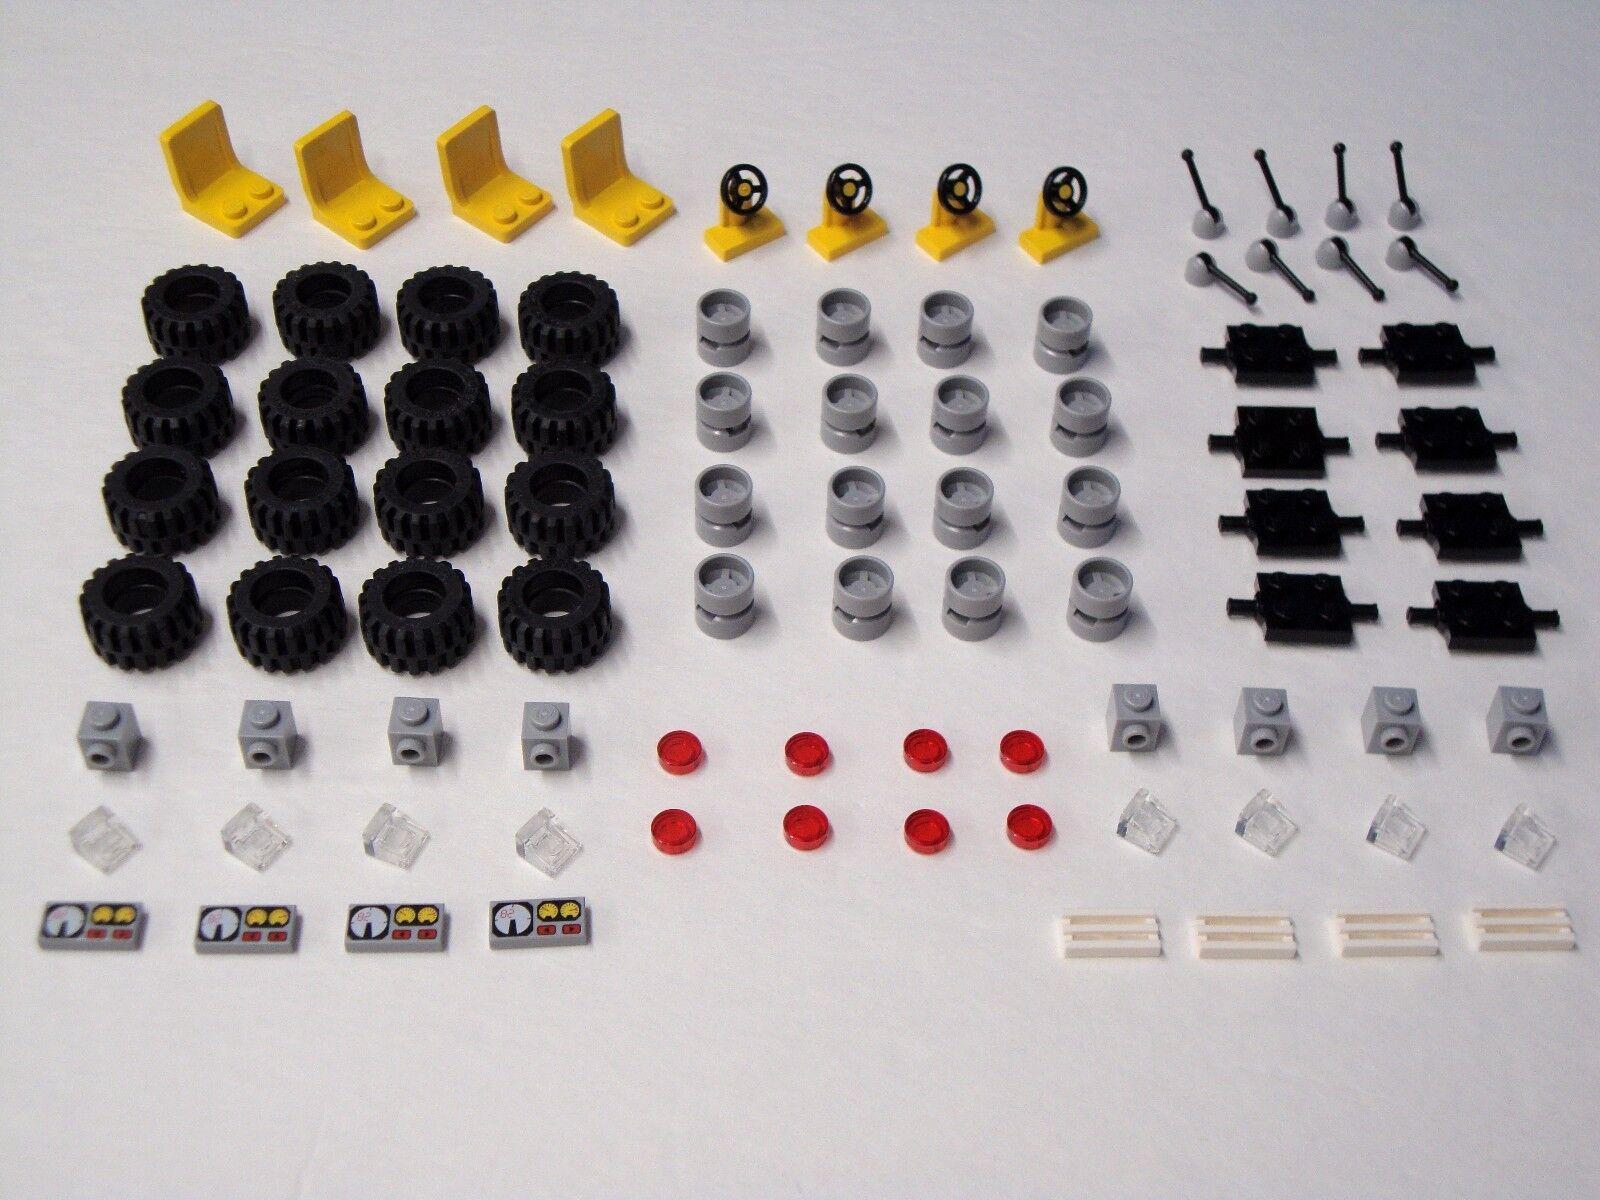 Car Parts - Lego Tires Steering Wheels Seats Axles 100% Lego Brand Bulk Pieces Car Parts Lot